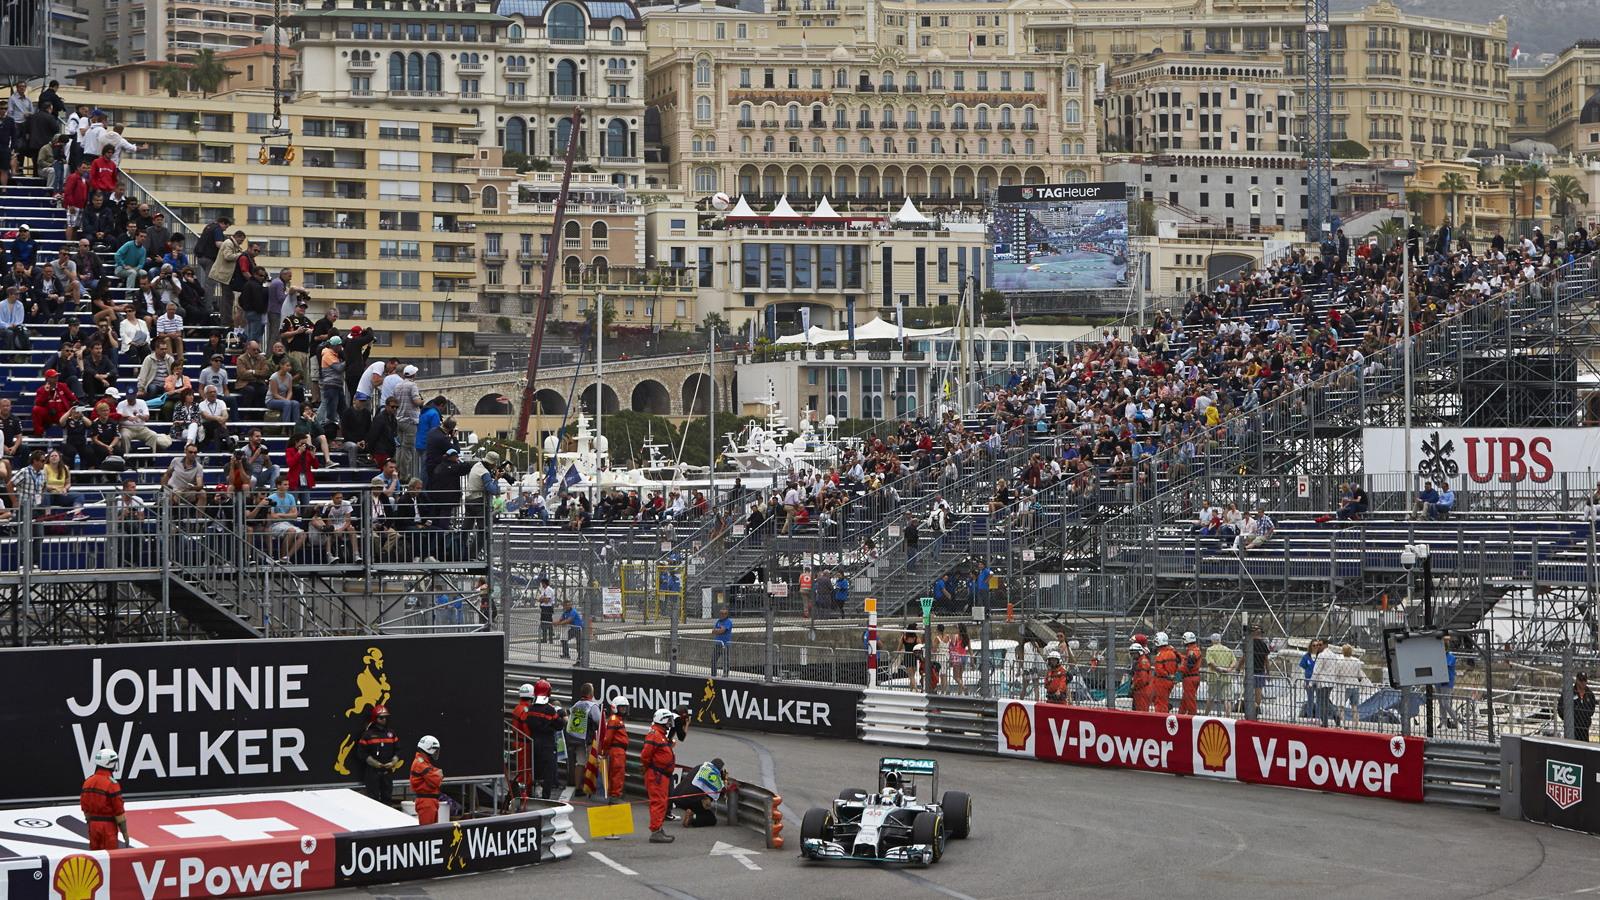 Nico Rosberg at the 2014 Formula One Monaco Grand Prix